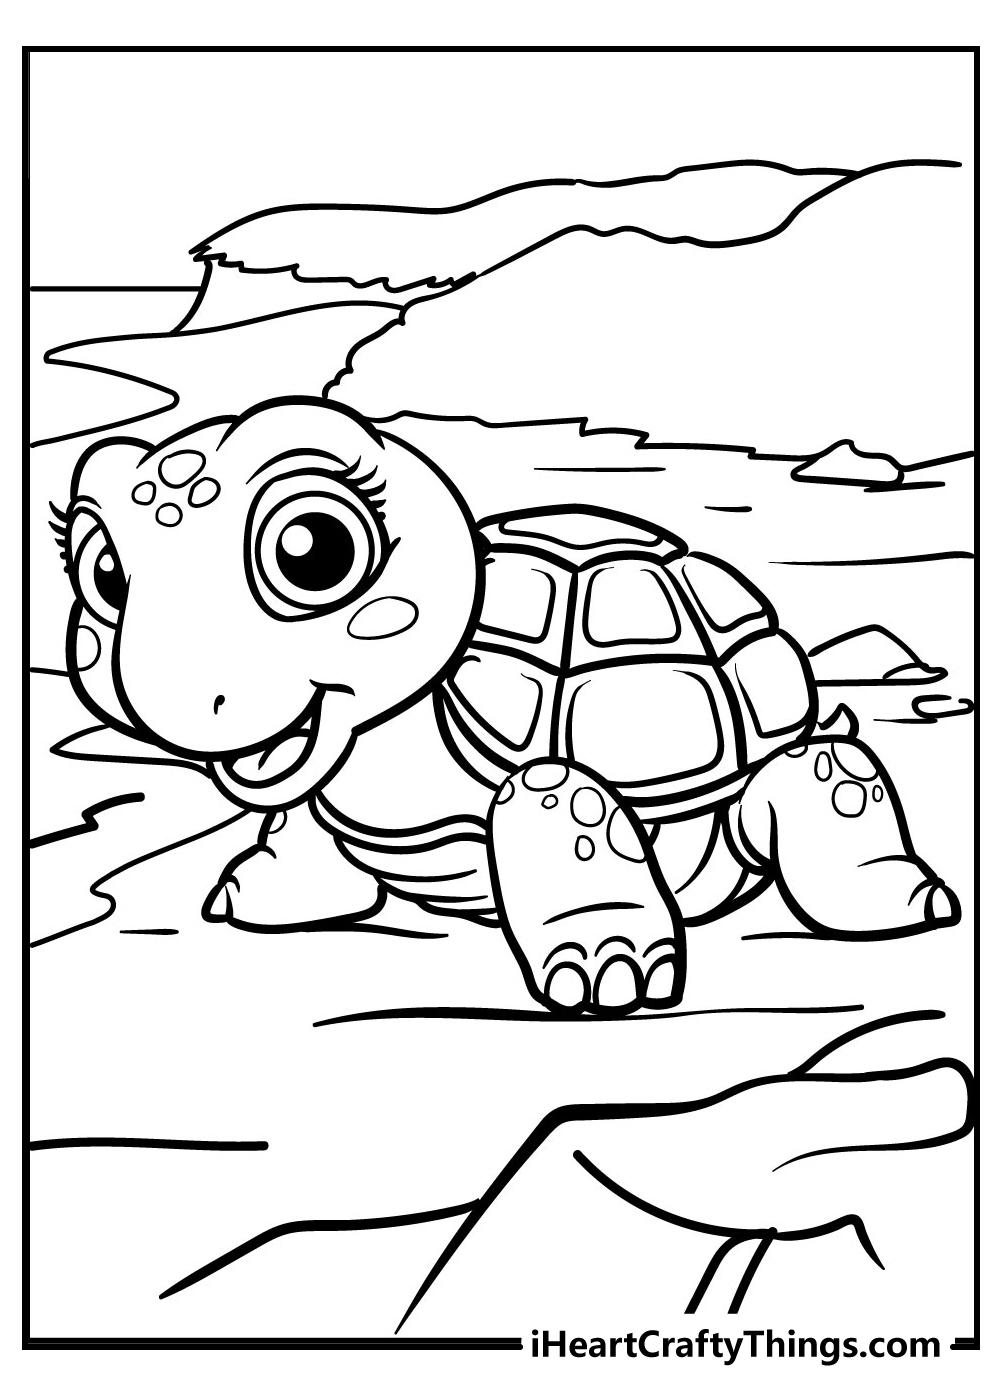 turtle drawing coloring image free printable